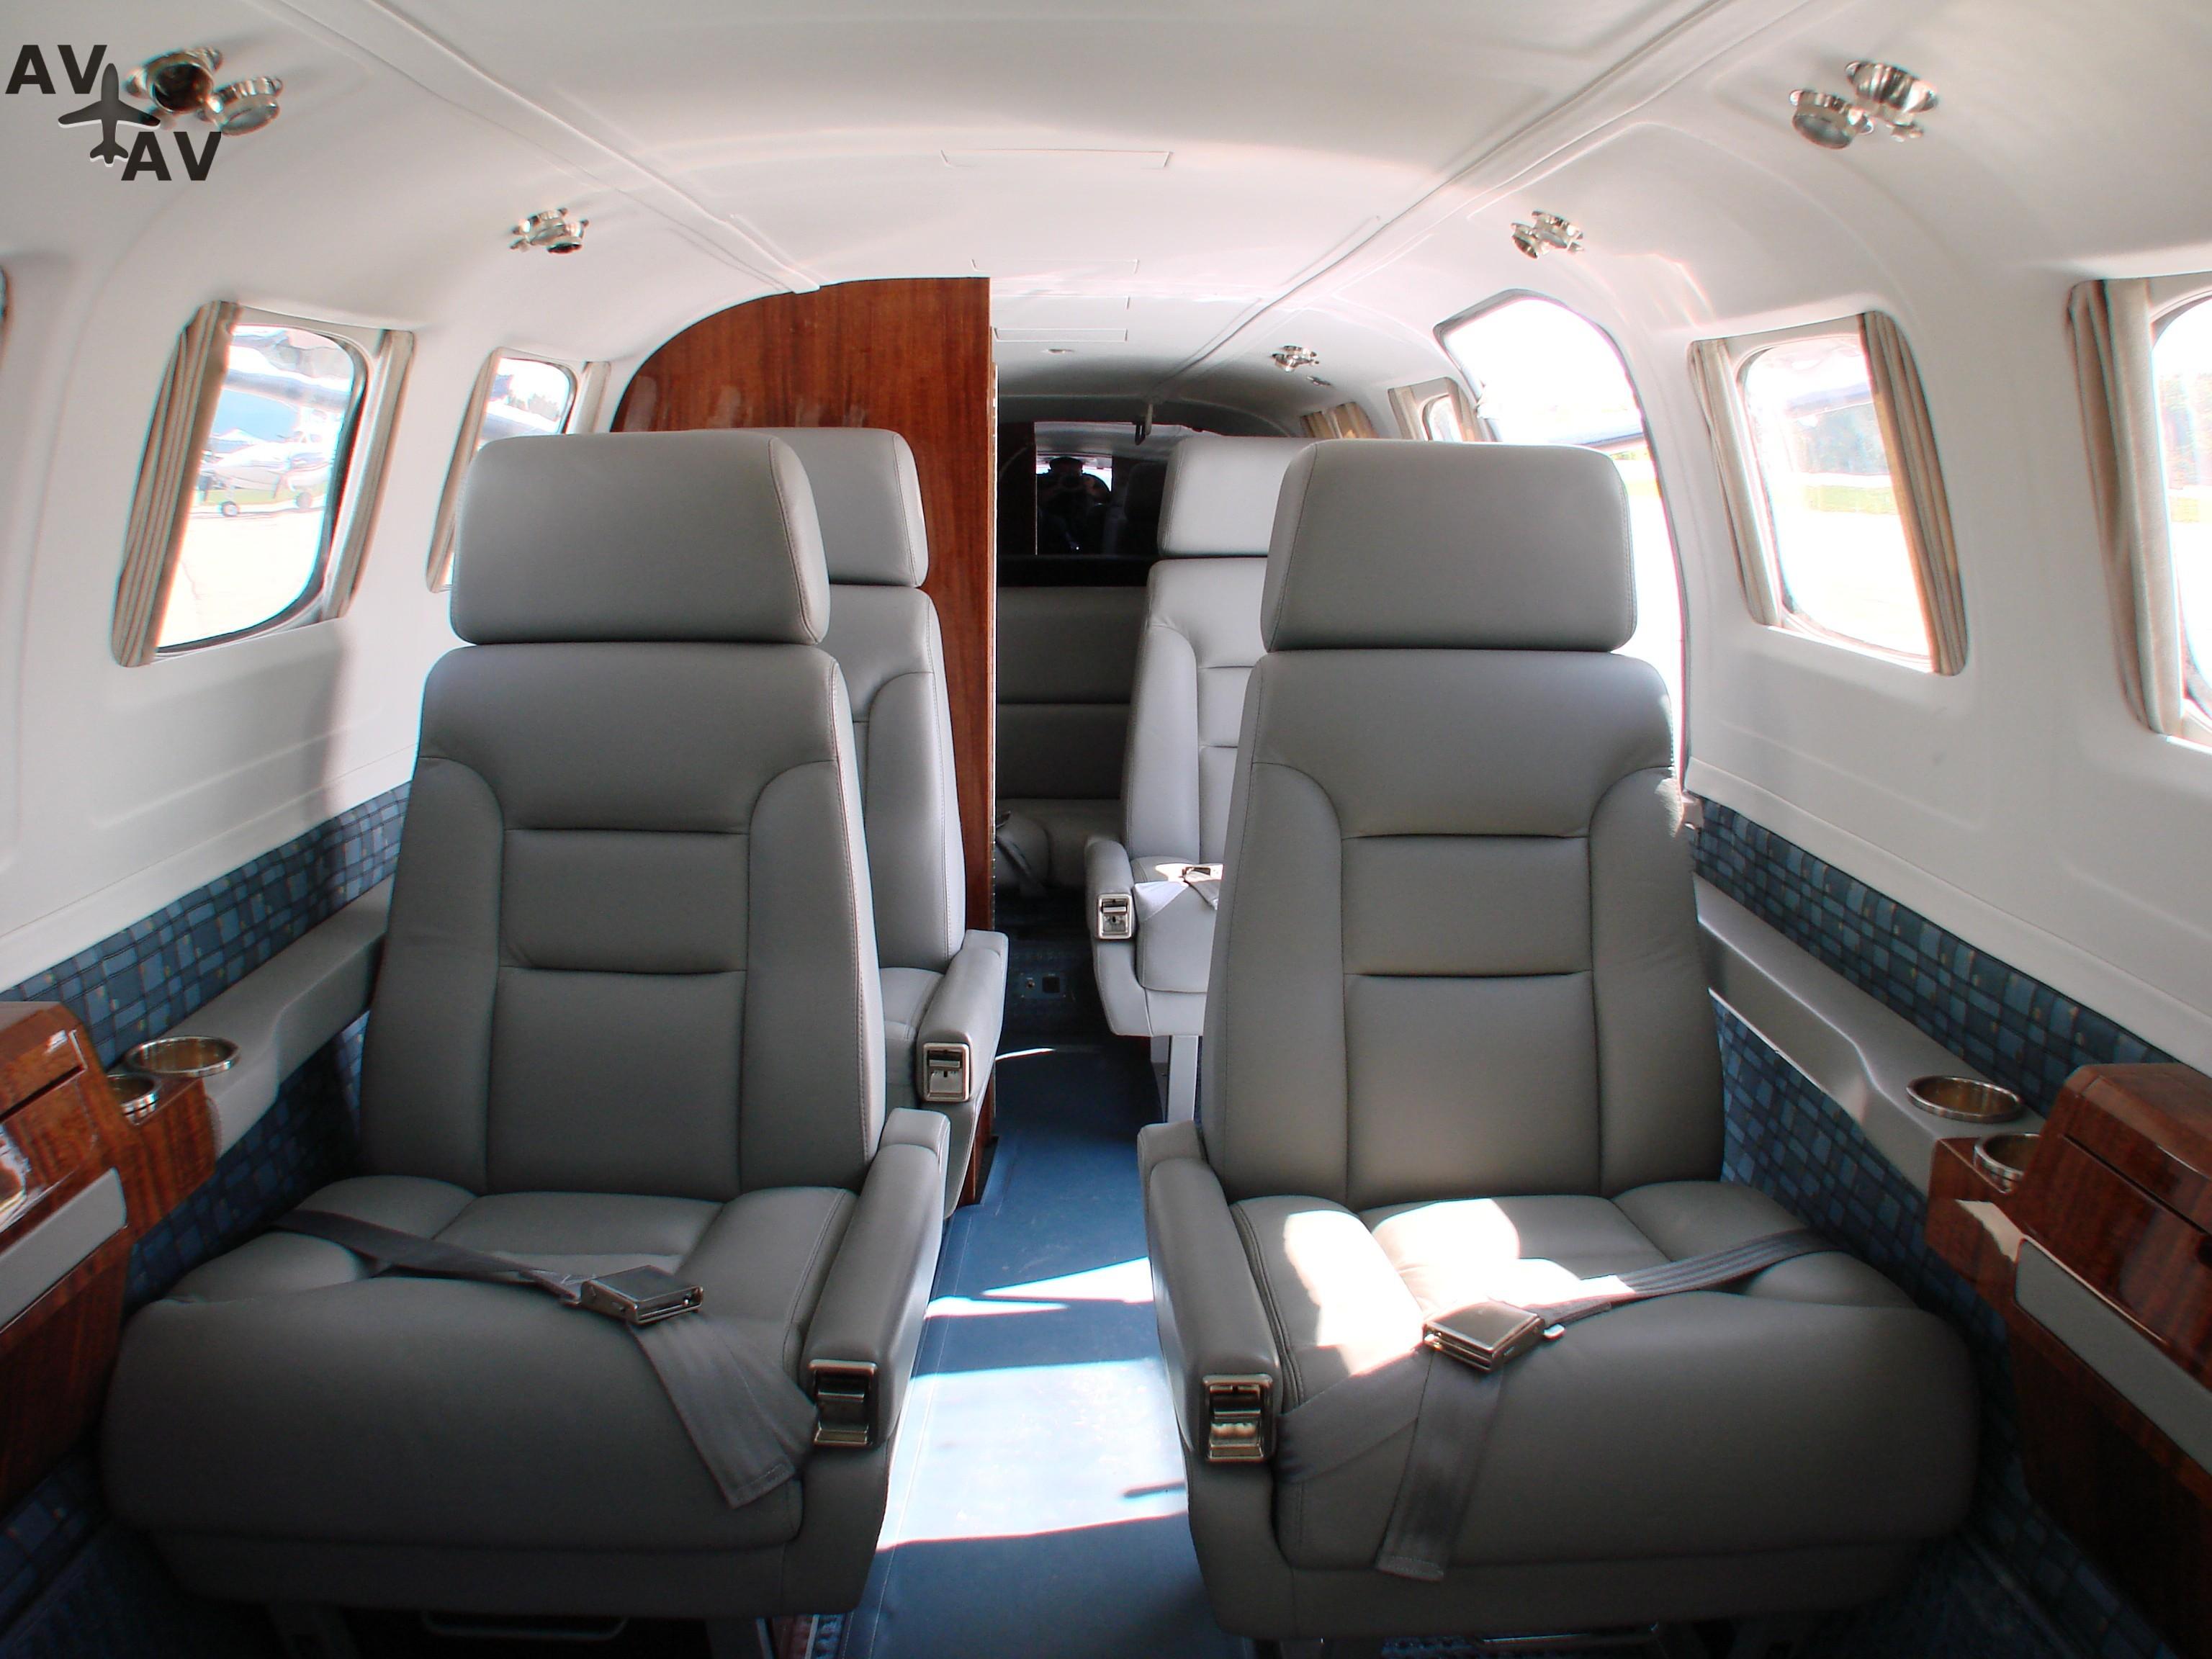 Cessna C441 Conquest II PrivateFly CC AA3398 - Charter a Cessna C441 Conquest II - Аренда